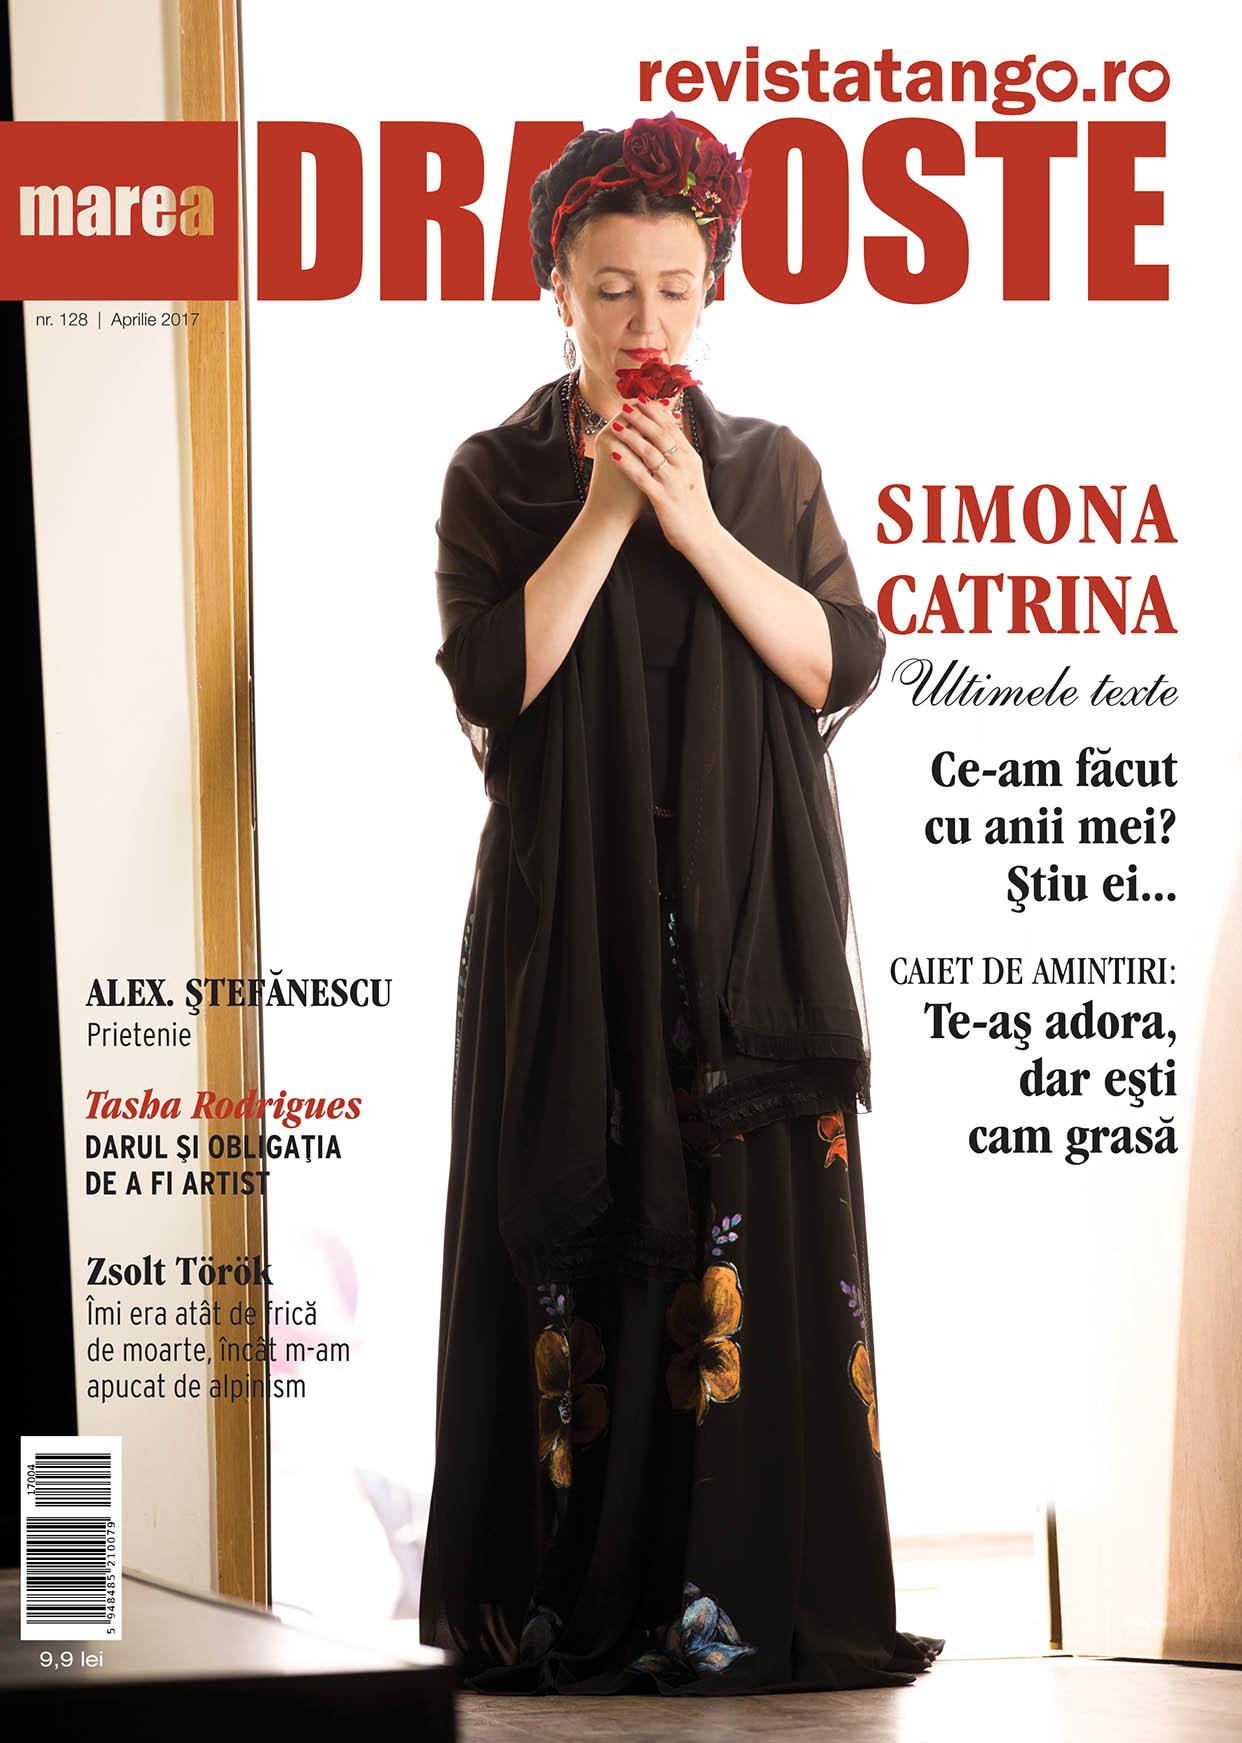 Simona Catrina pe coperta Marea Dragoste-revistatango.ro, nr. 128, aprilie 2017